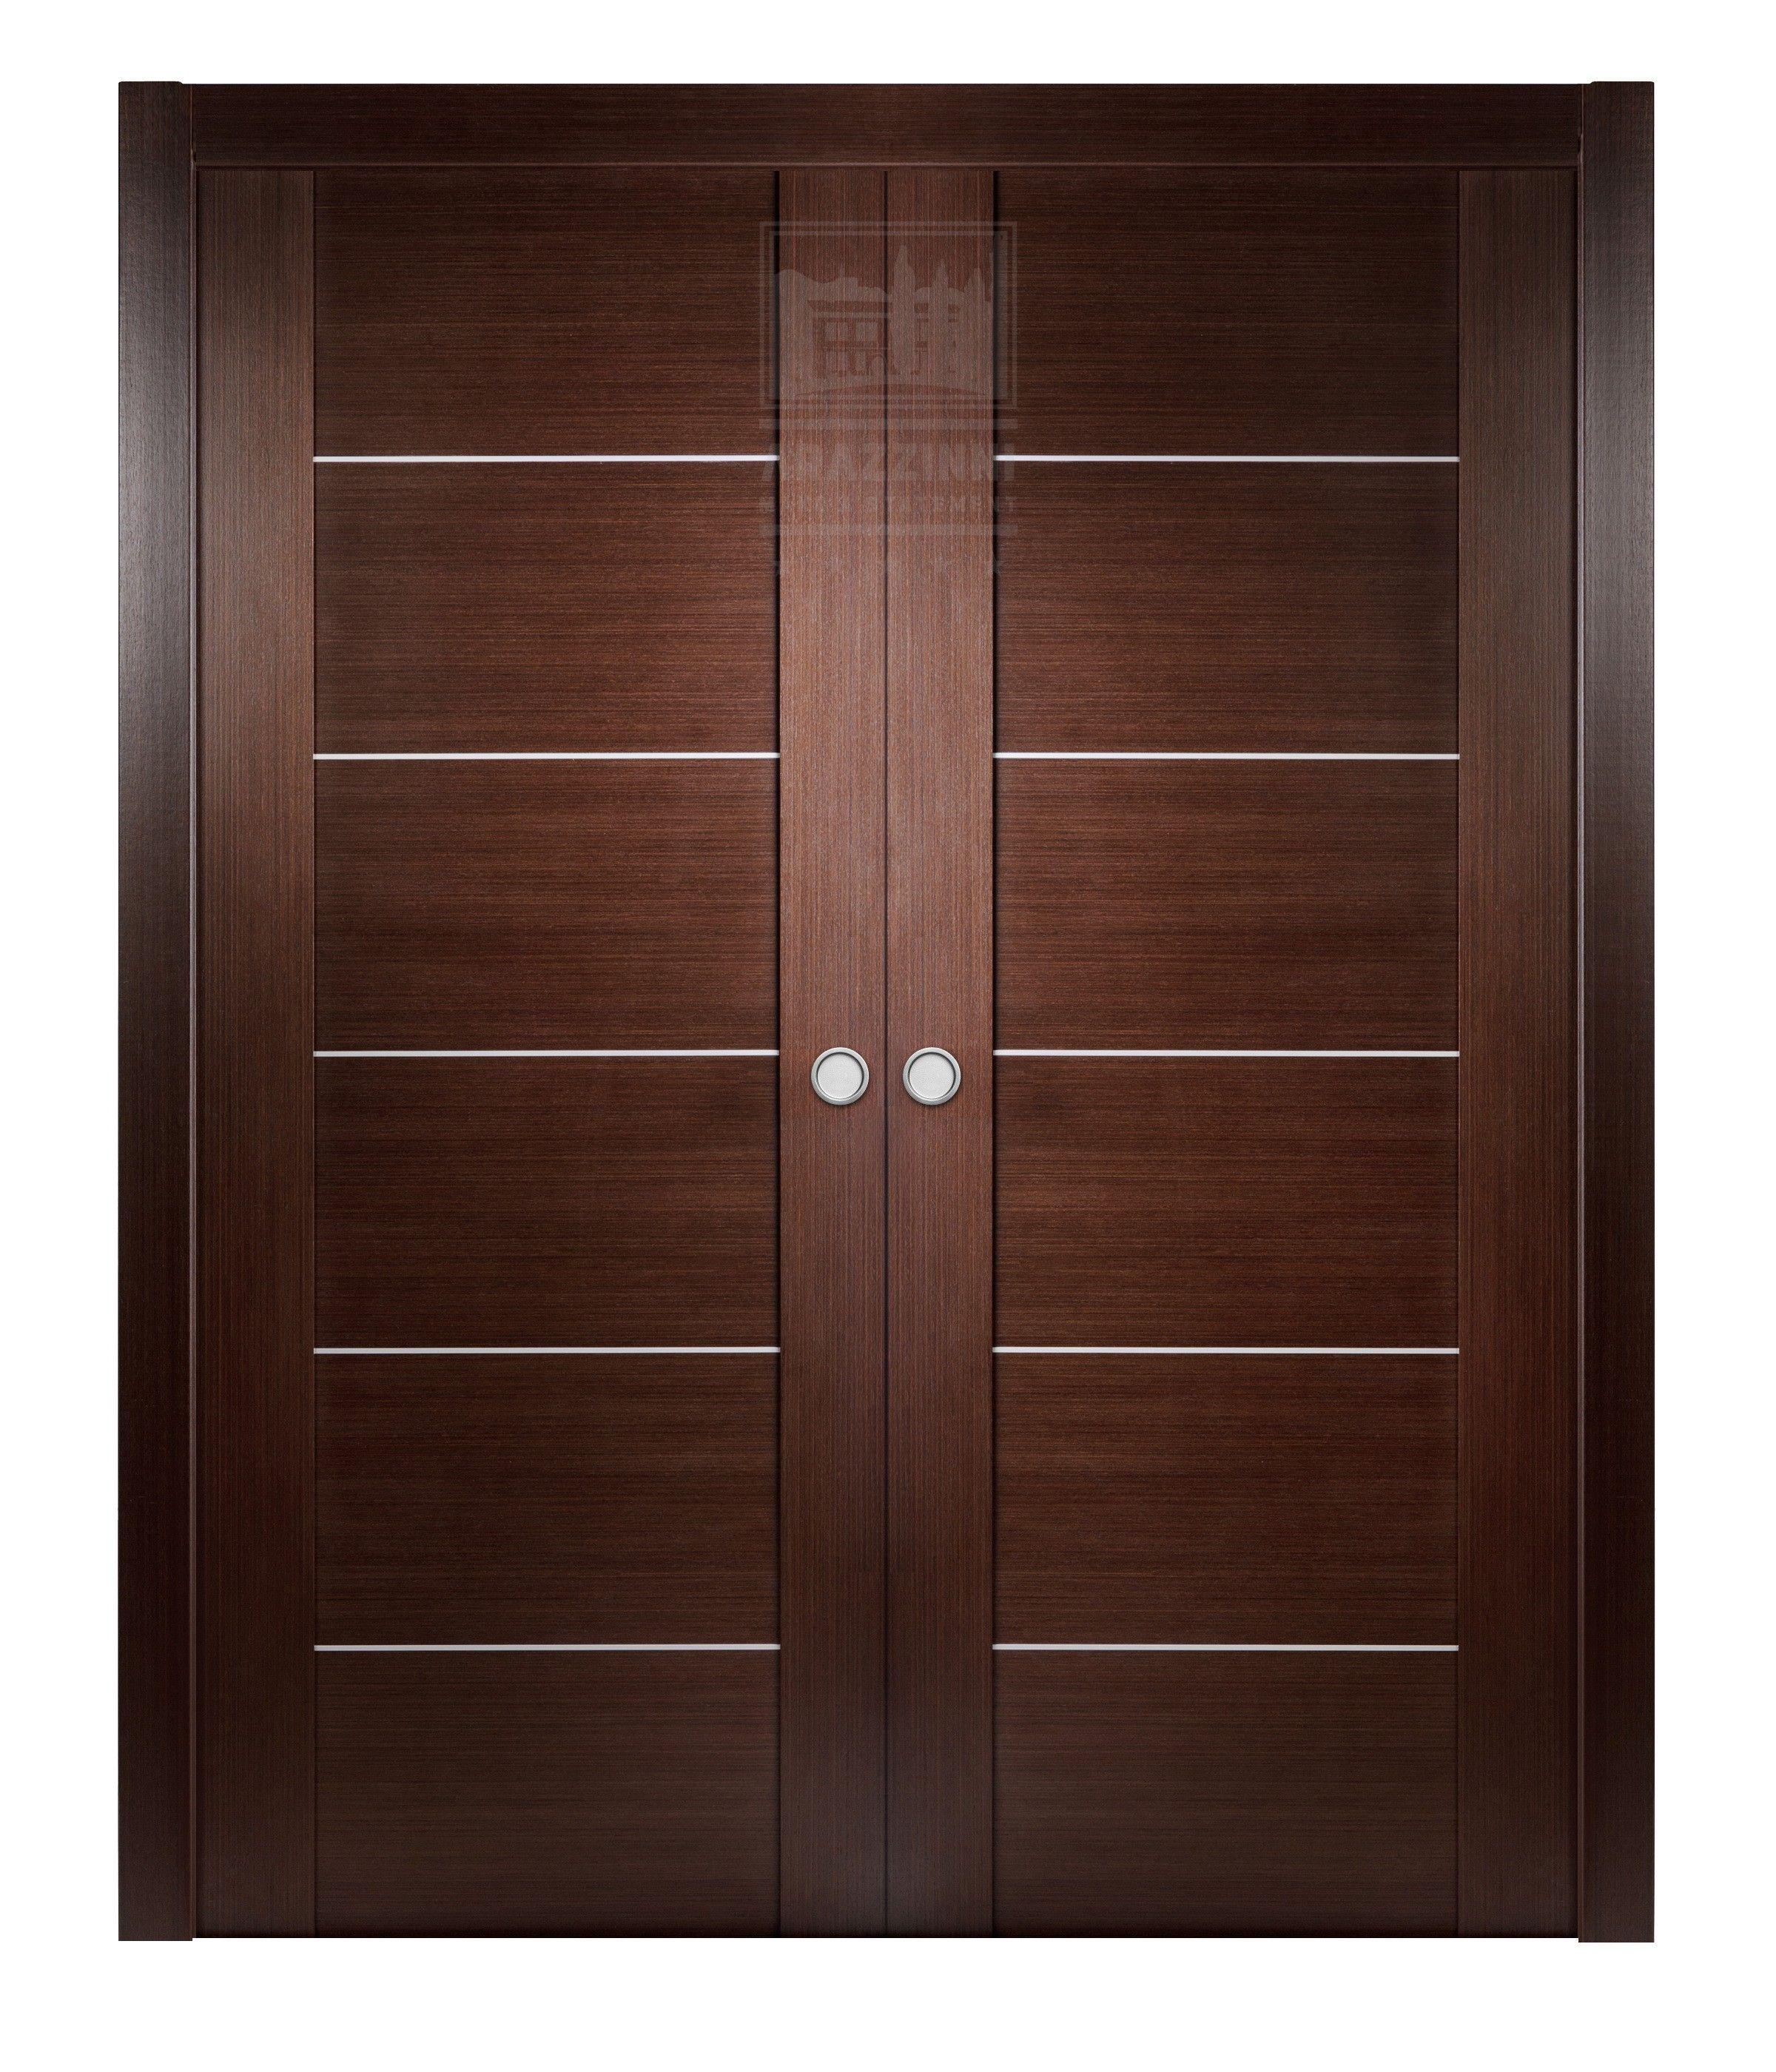 Arazzinni Maximum 201 Interior Double Pocket Door Wenge